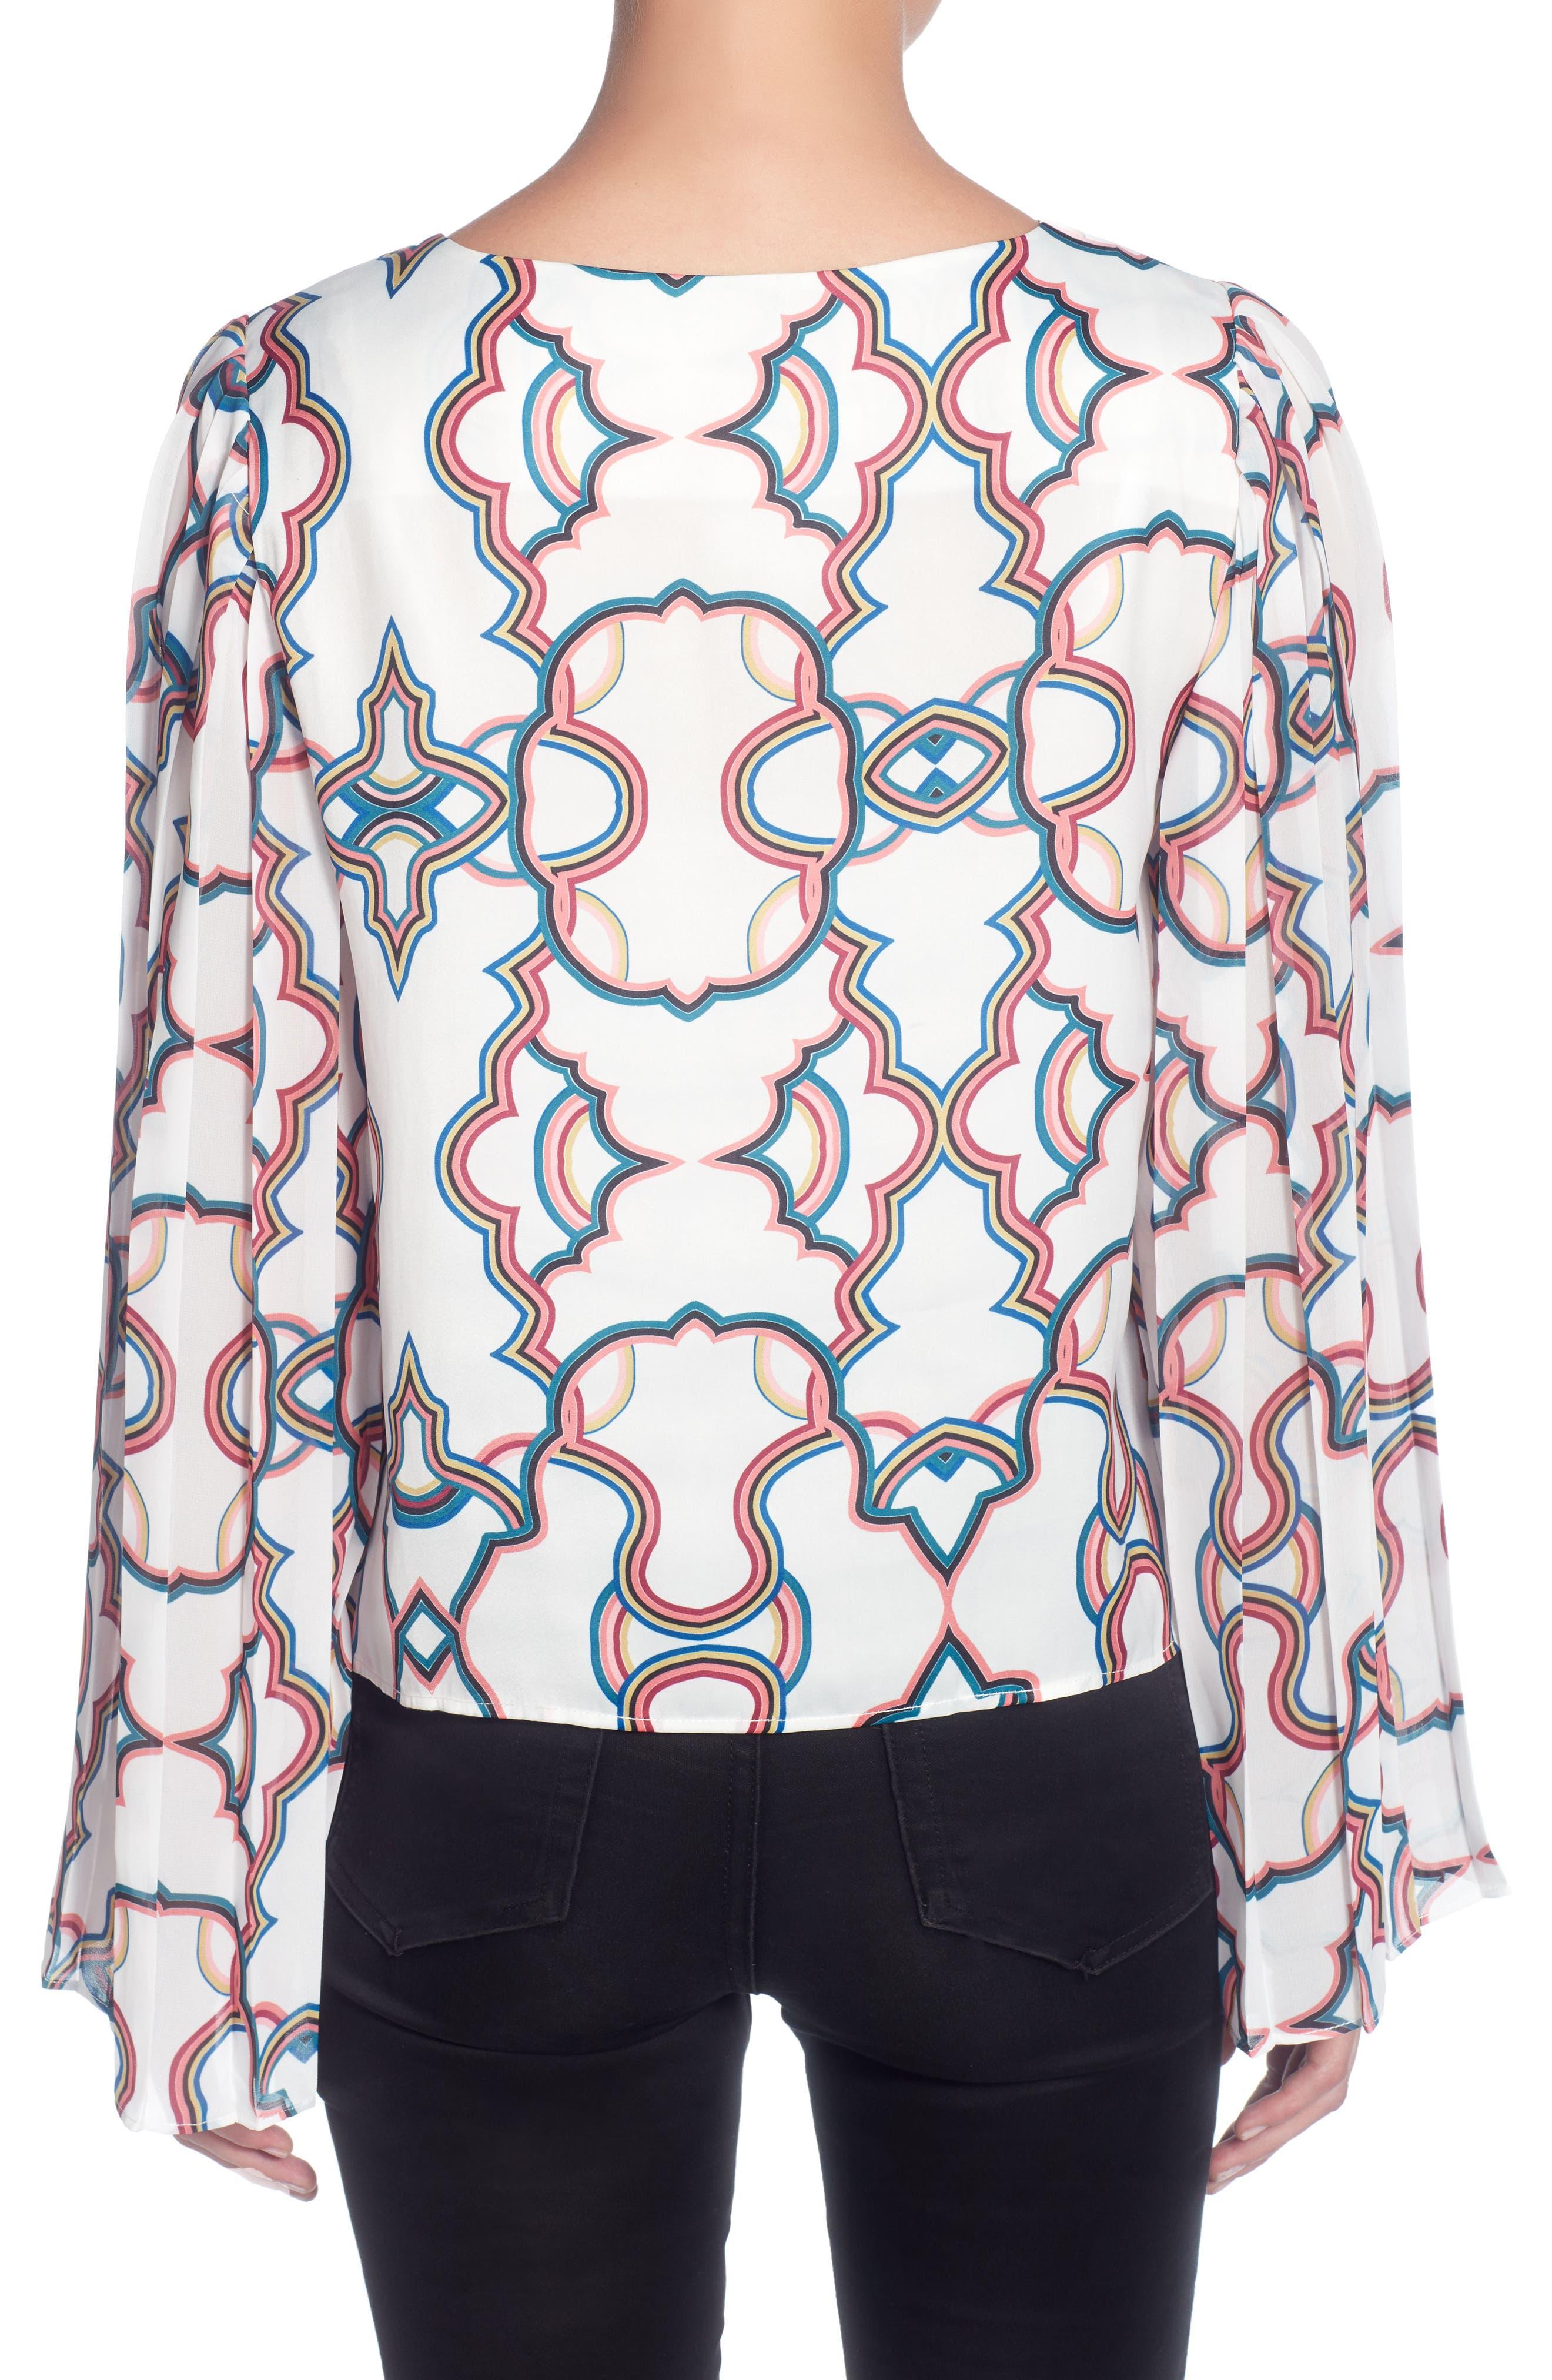 Deni Pleated Sleeve Top,                             Alternate thumbnail 2, color,                             Kaleidoscope White